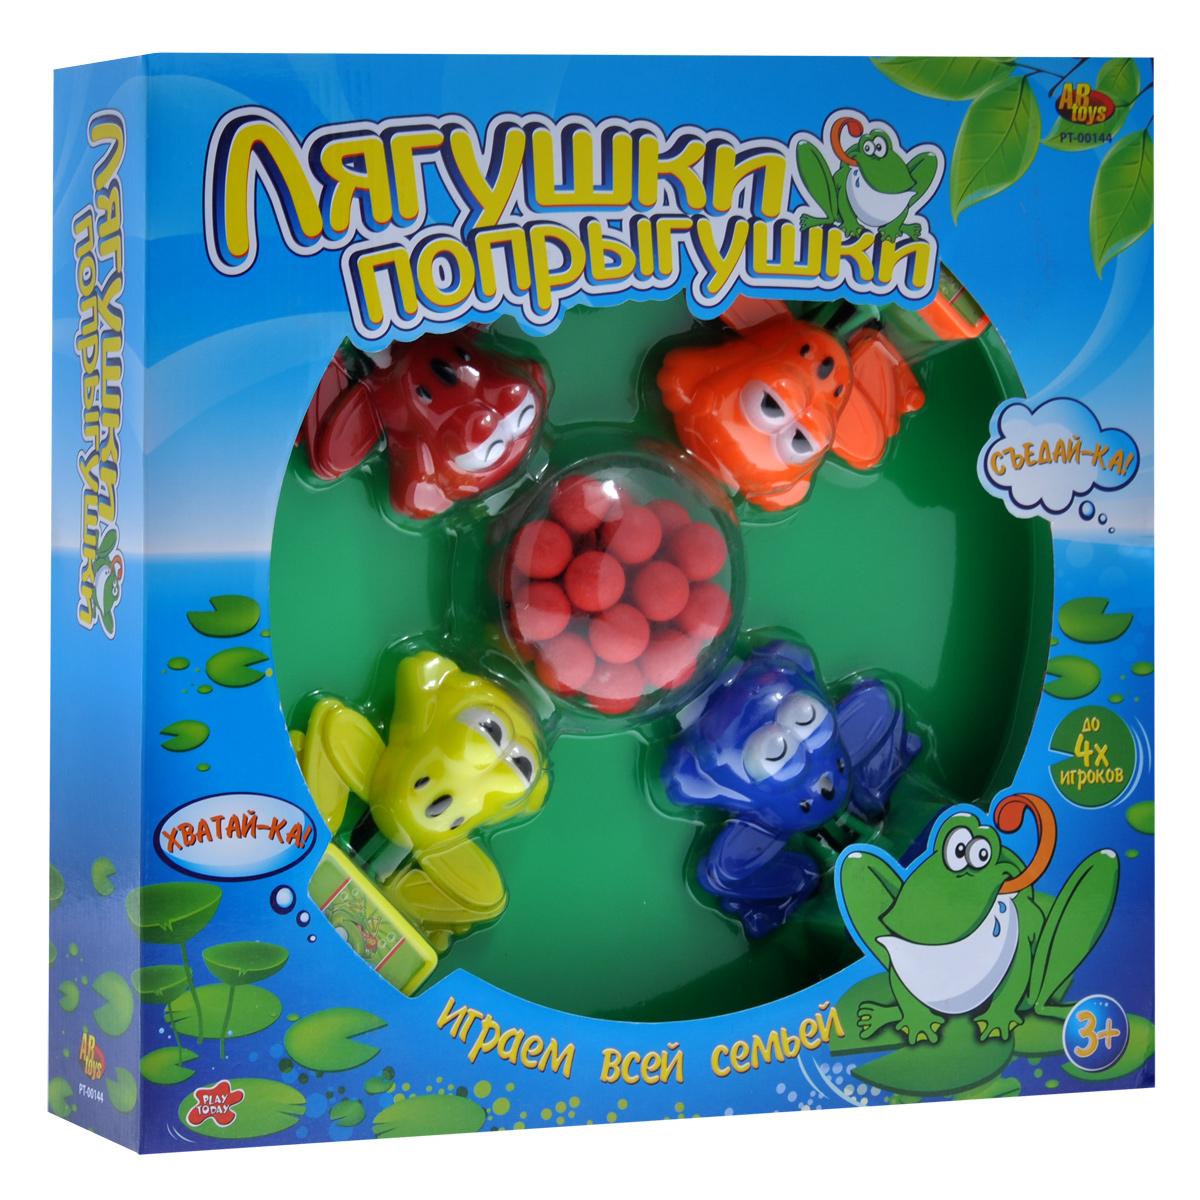 Игра настольная Лягушки-попрыгушки настольная игра abtoys футбол s 00092 wa c8044 50 5 х 29 х 9 см